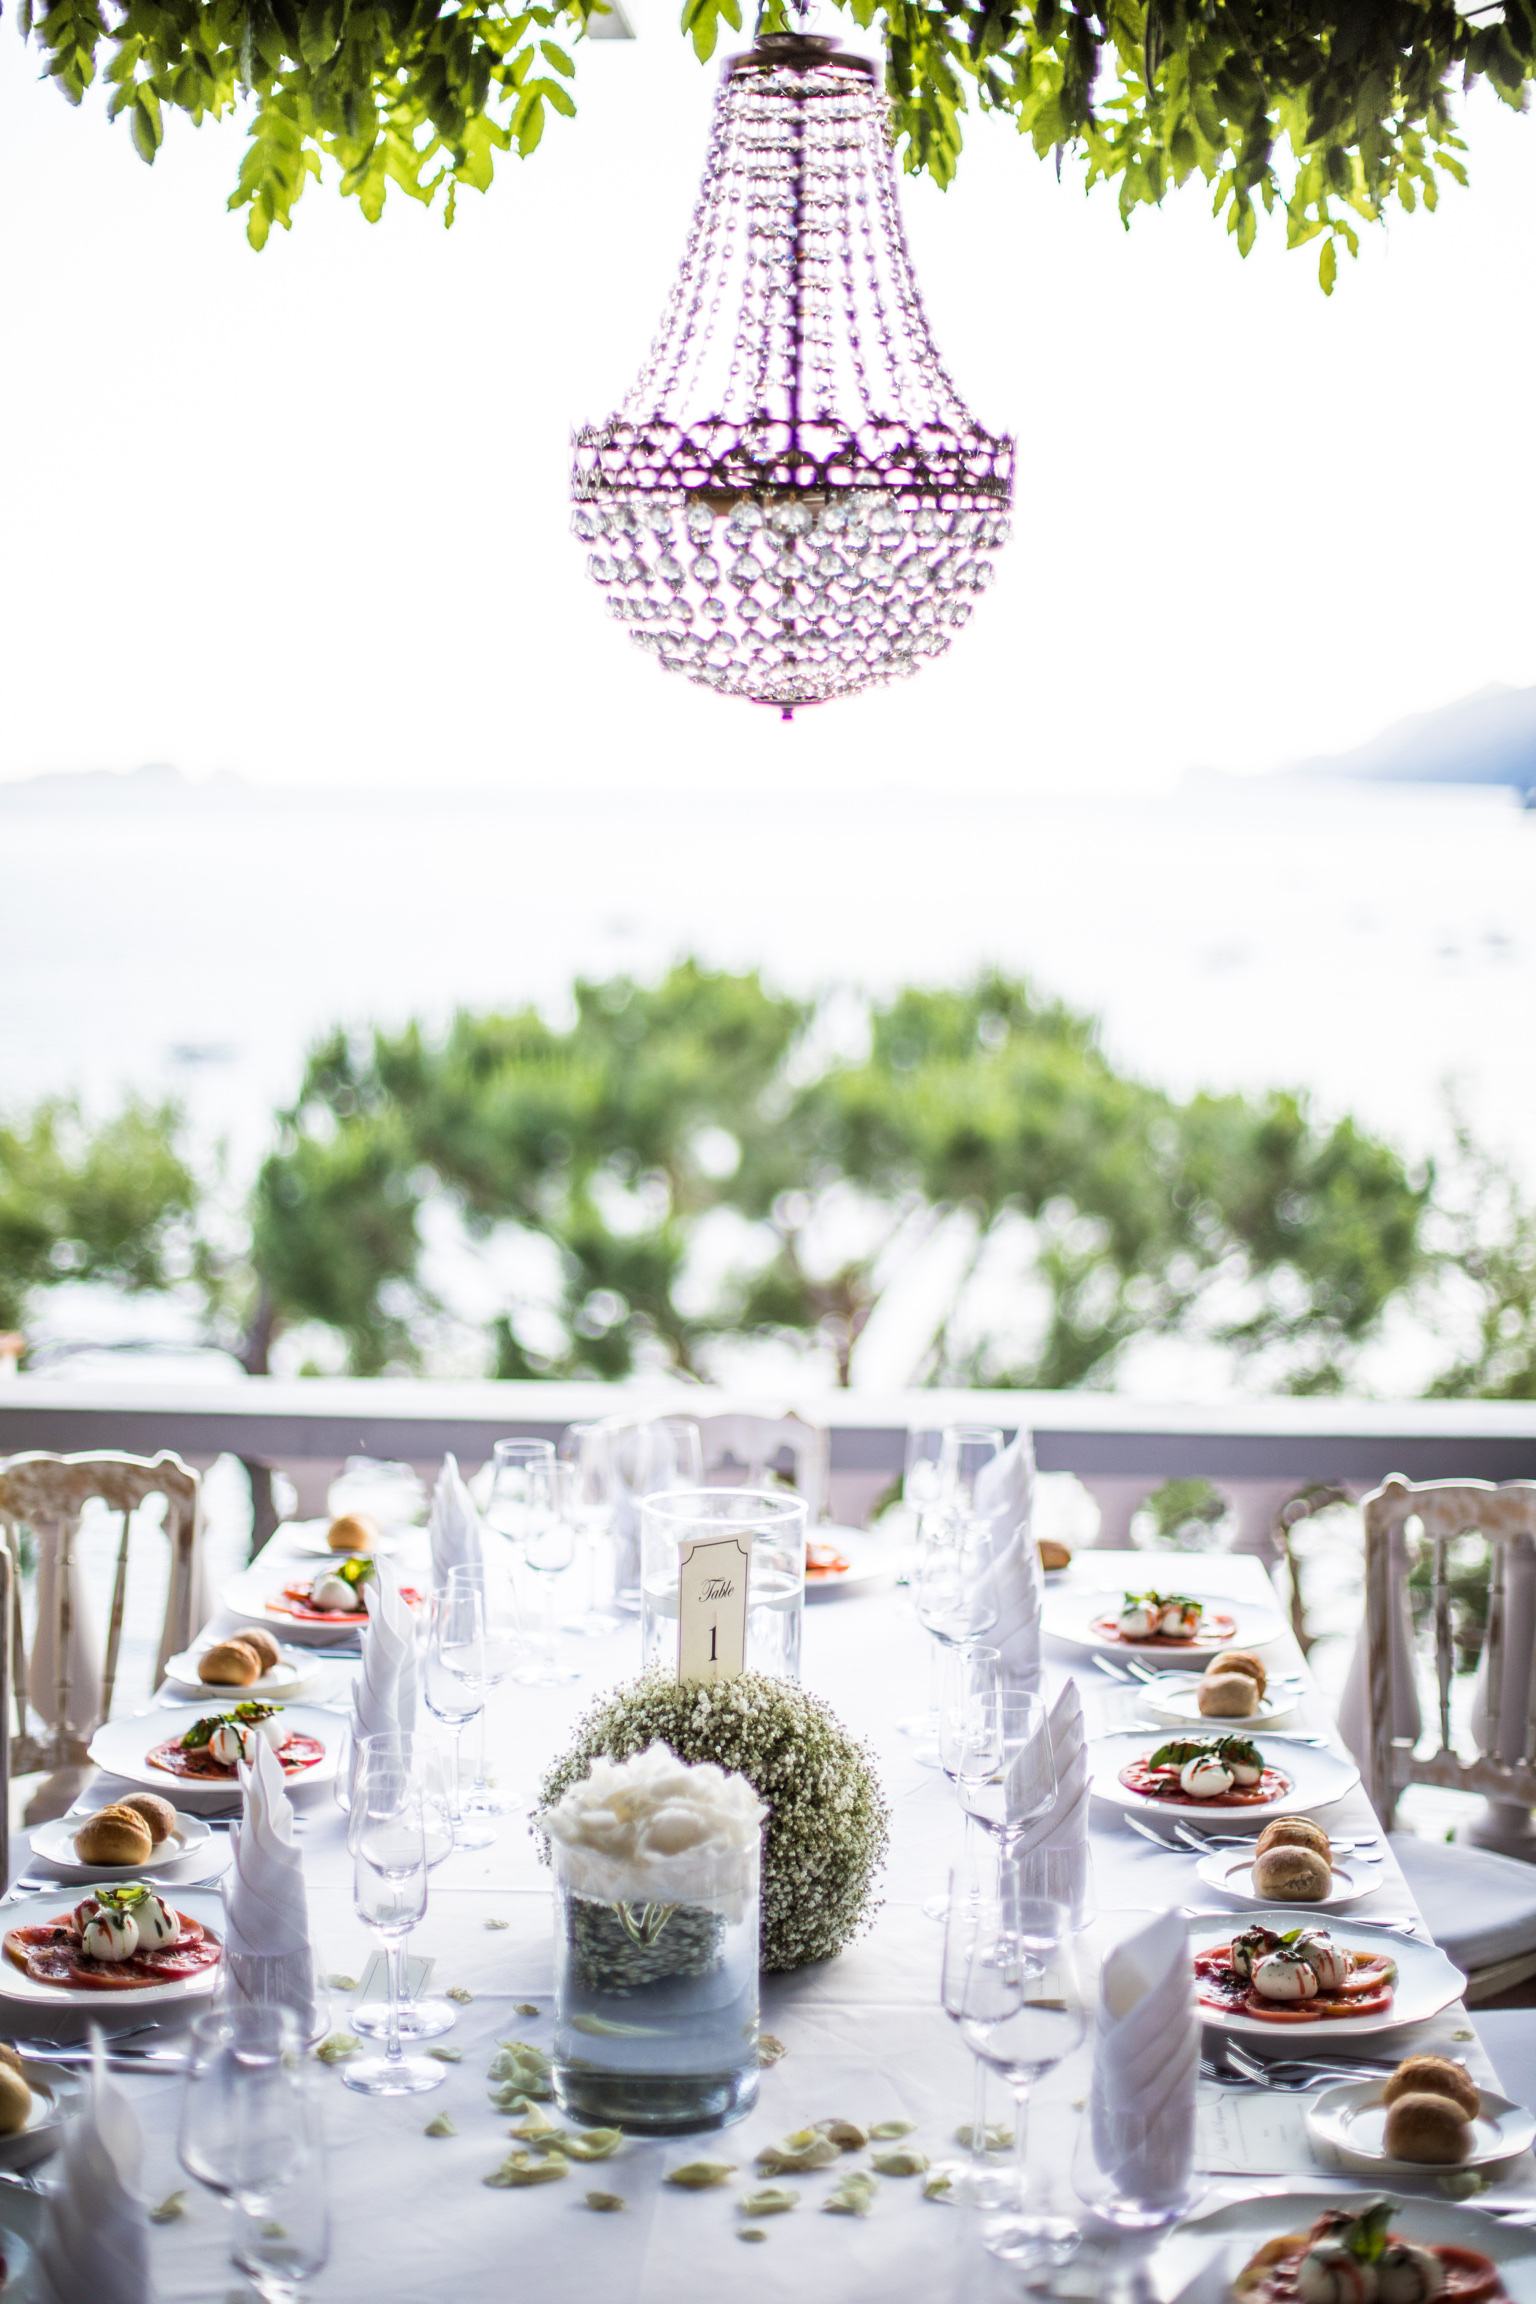 https://www.weddingamalfi.com/wp-content/uploads/Nathalie-and-Benjamin-Wedding-in-Positano-Italy-27.jpg